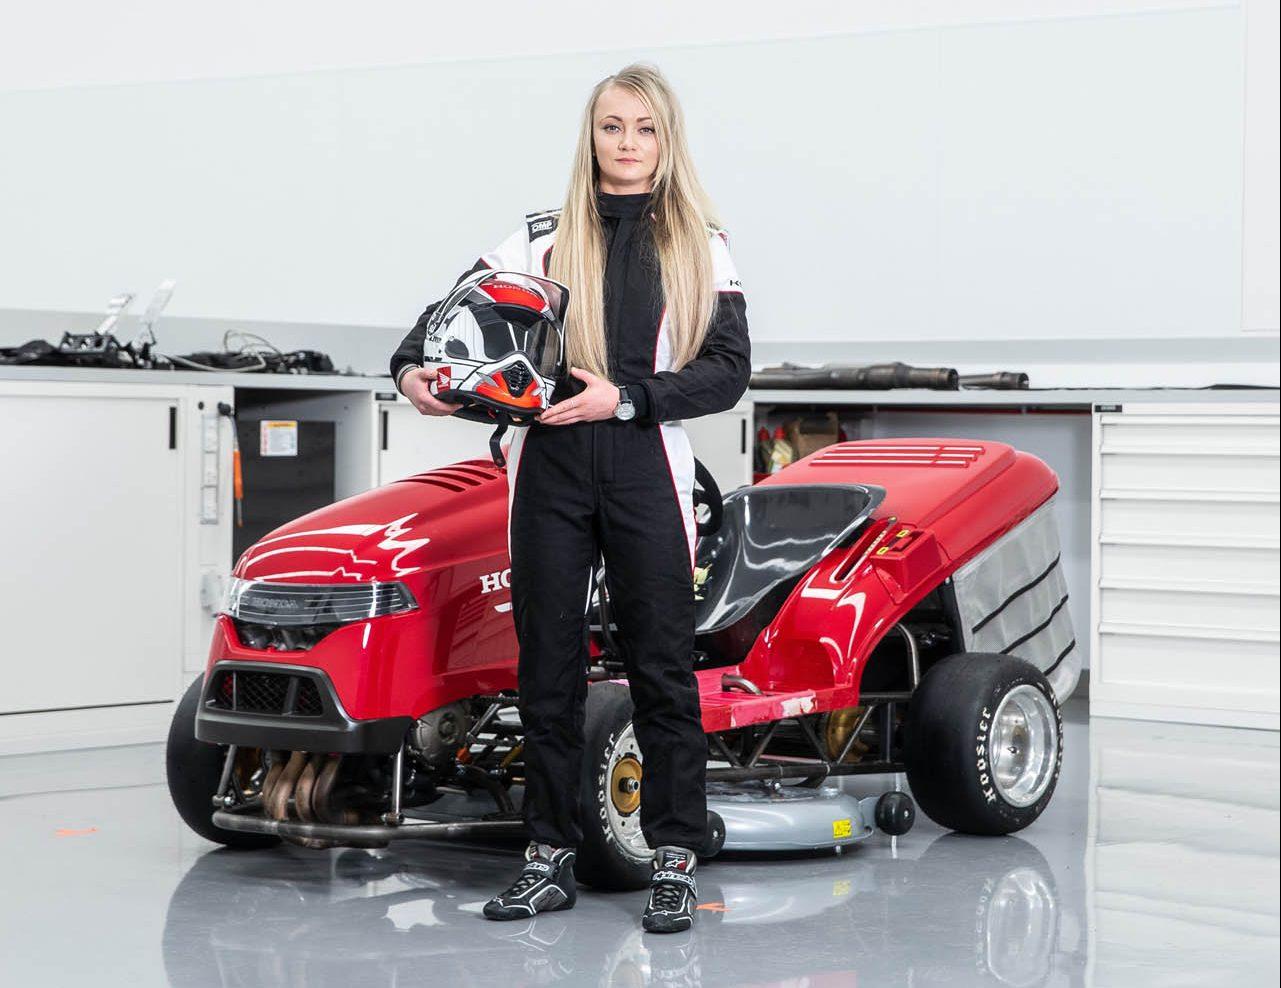 Honda Mean Mover V2 met Jess Hawkins